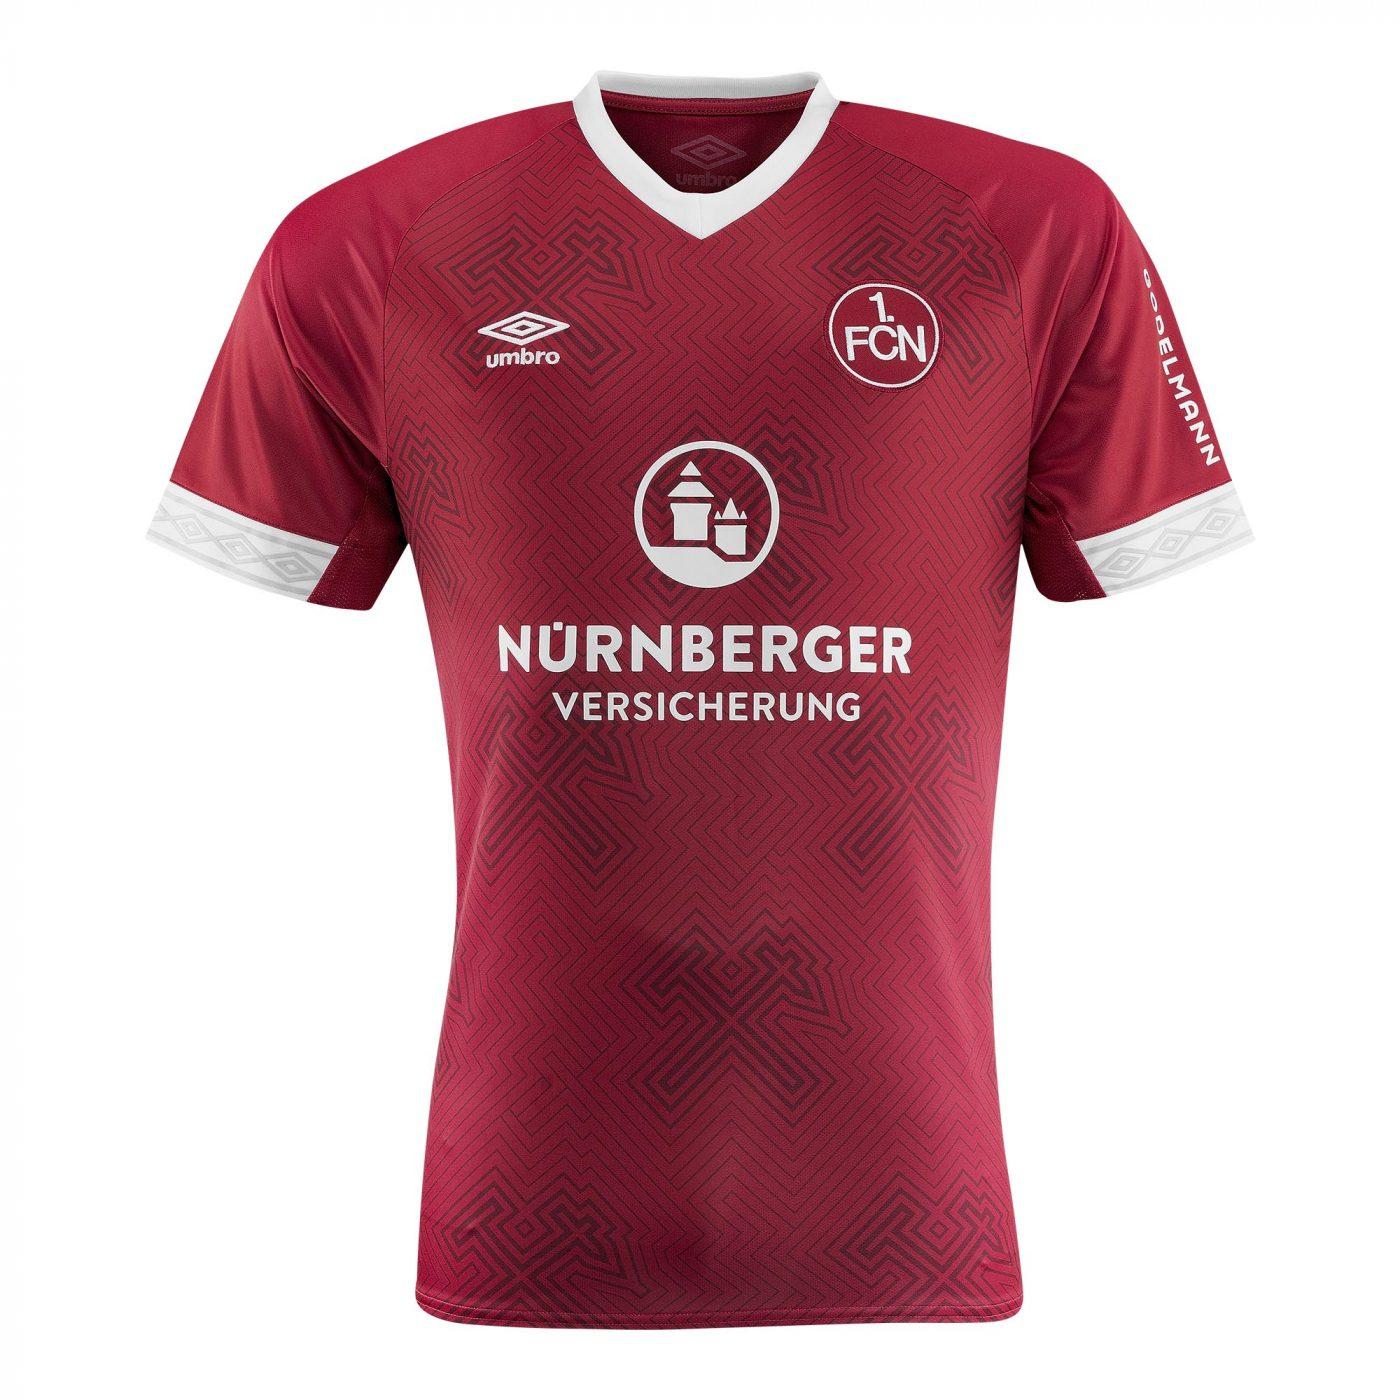 echange-maillot-schalke-04-fc-nuremberg-clubs-amis-bundesliga-umbro-1